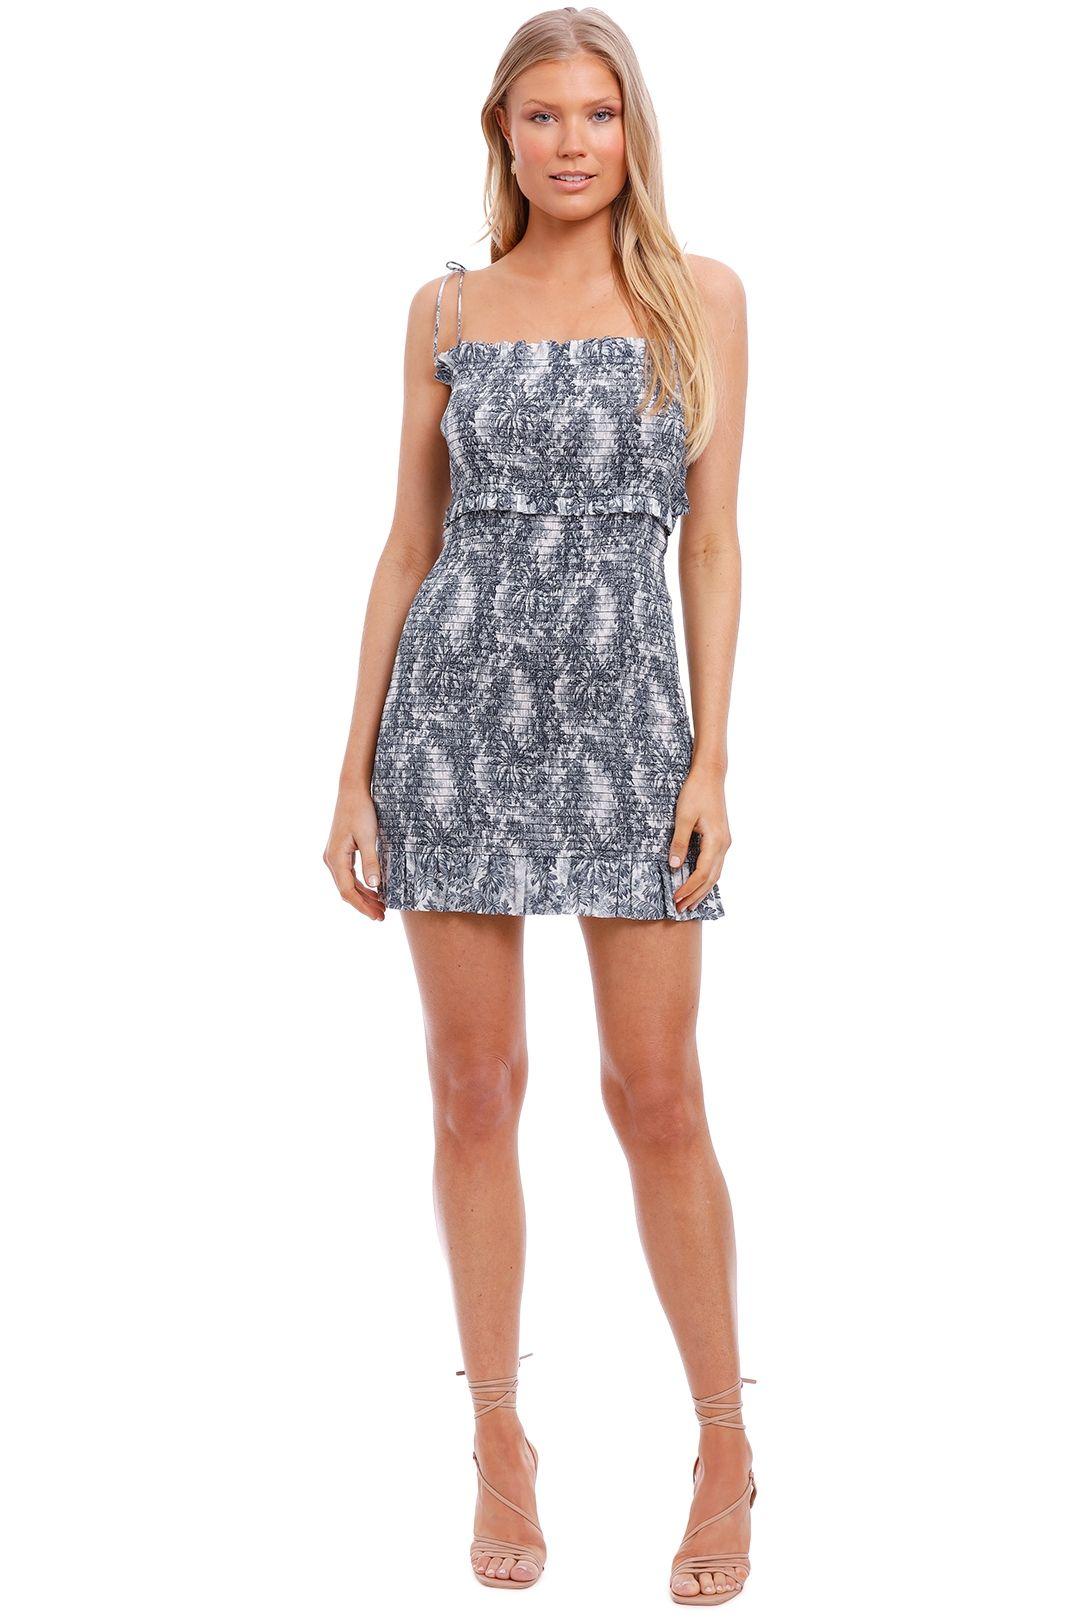 Bec and Bridge Arianne Print Mini Dress navy blue